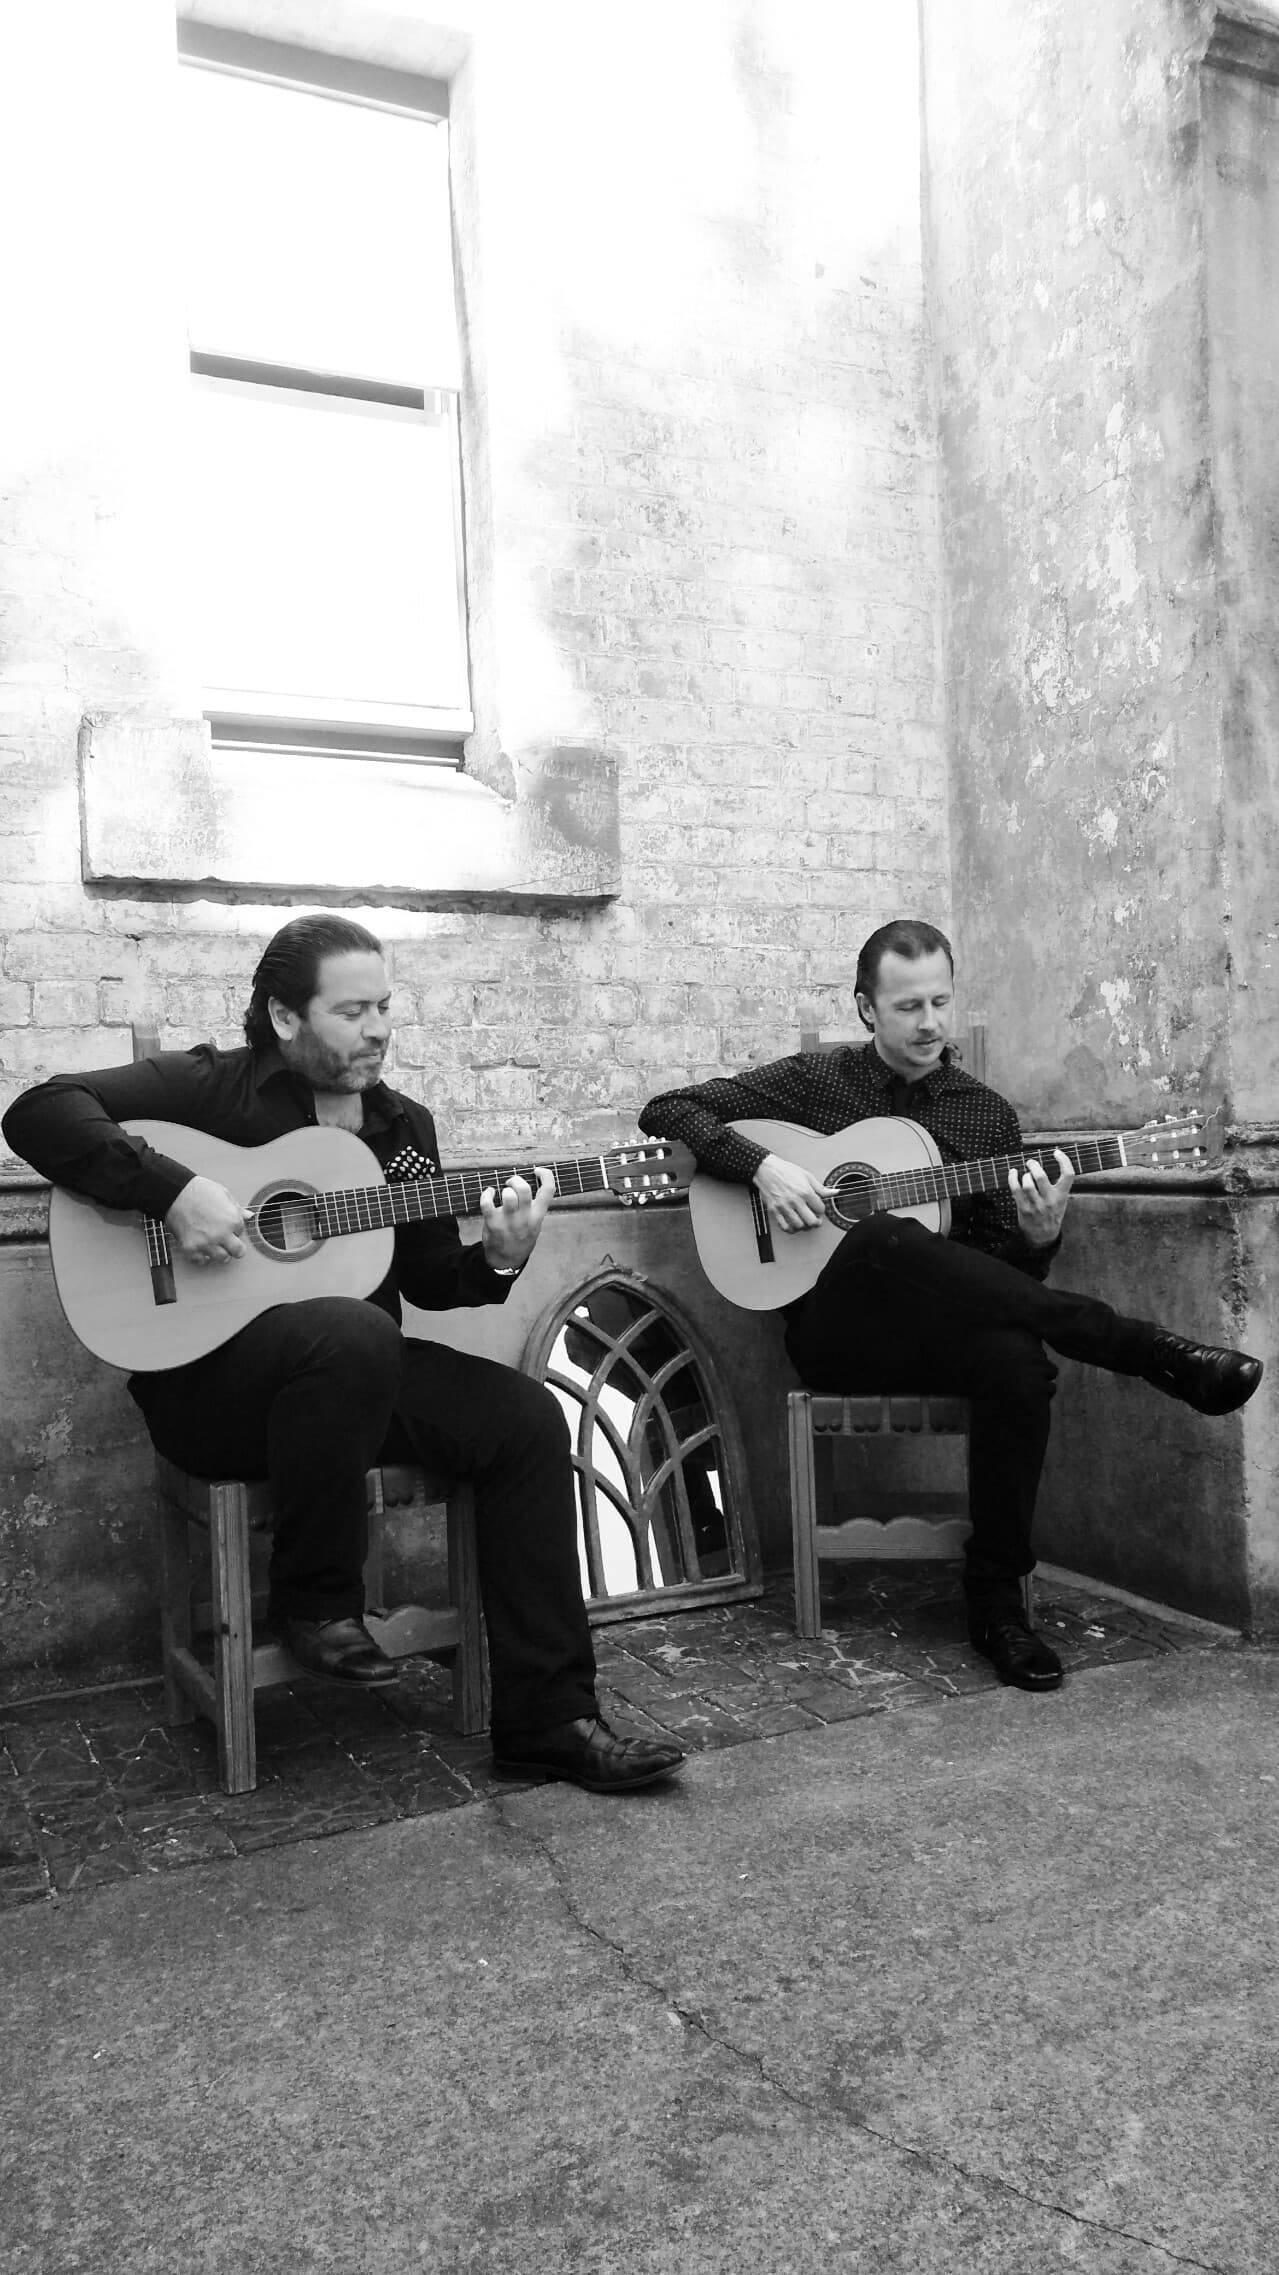 GUITARRA FLAMENCA - PACO LARA (SPAIN) & DAMIAN WRIGHT (AUS) @ Tomerong